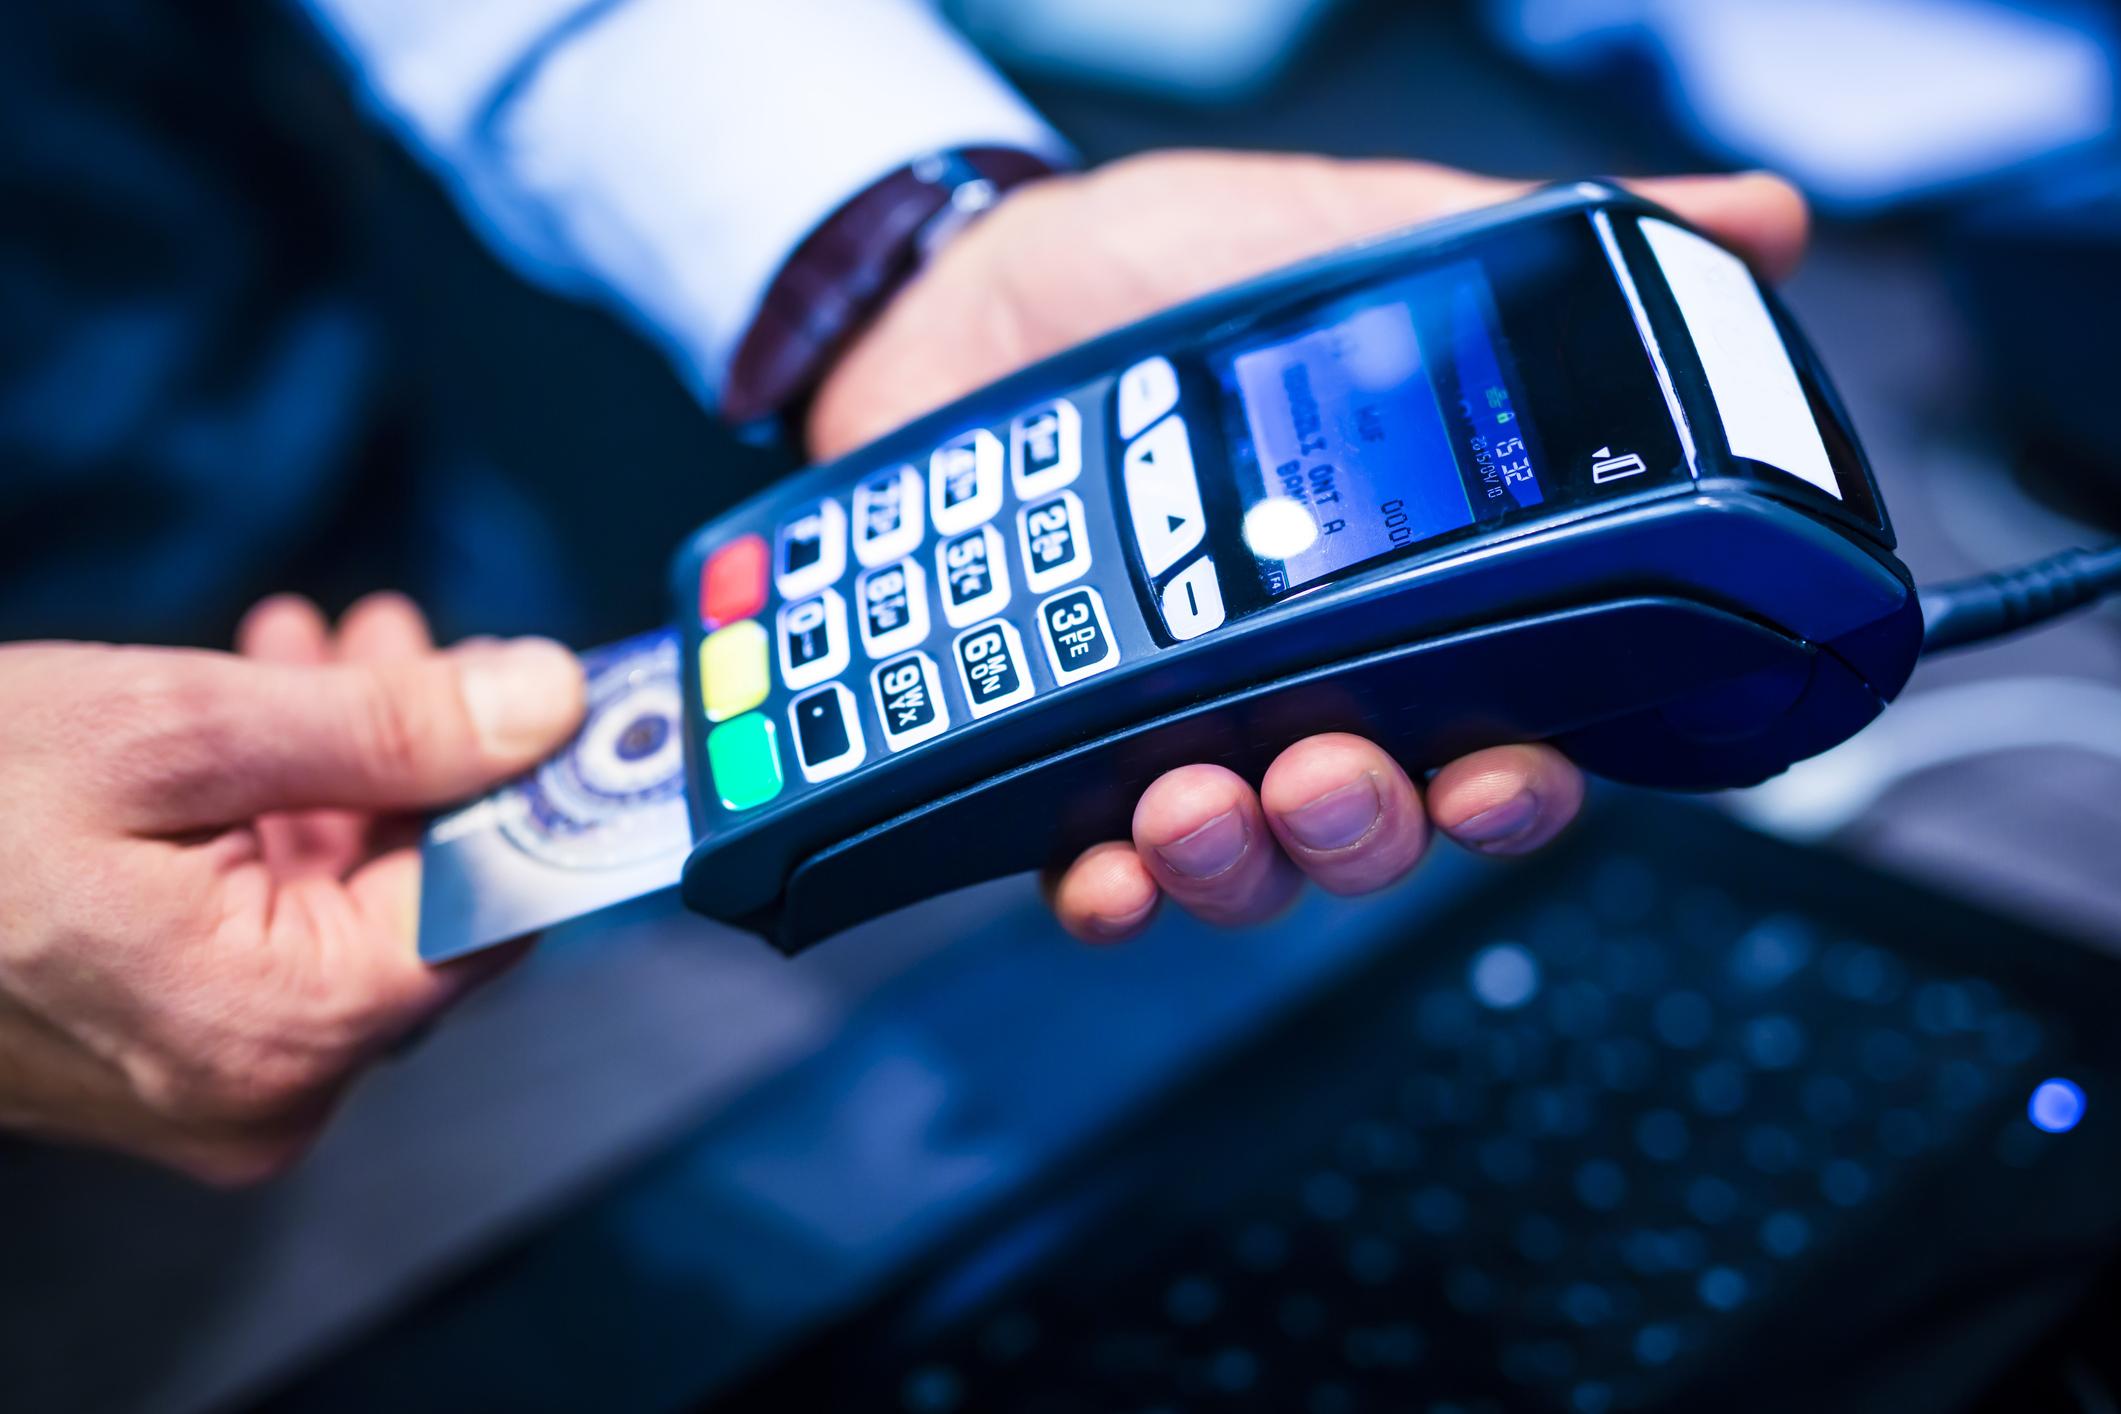 A handheld credit card reader.